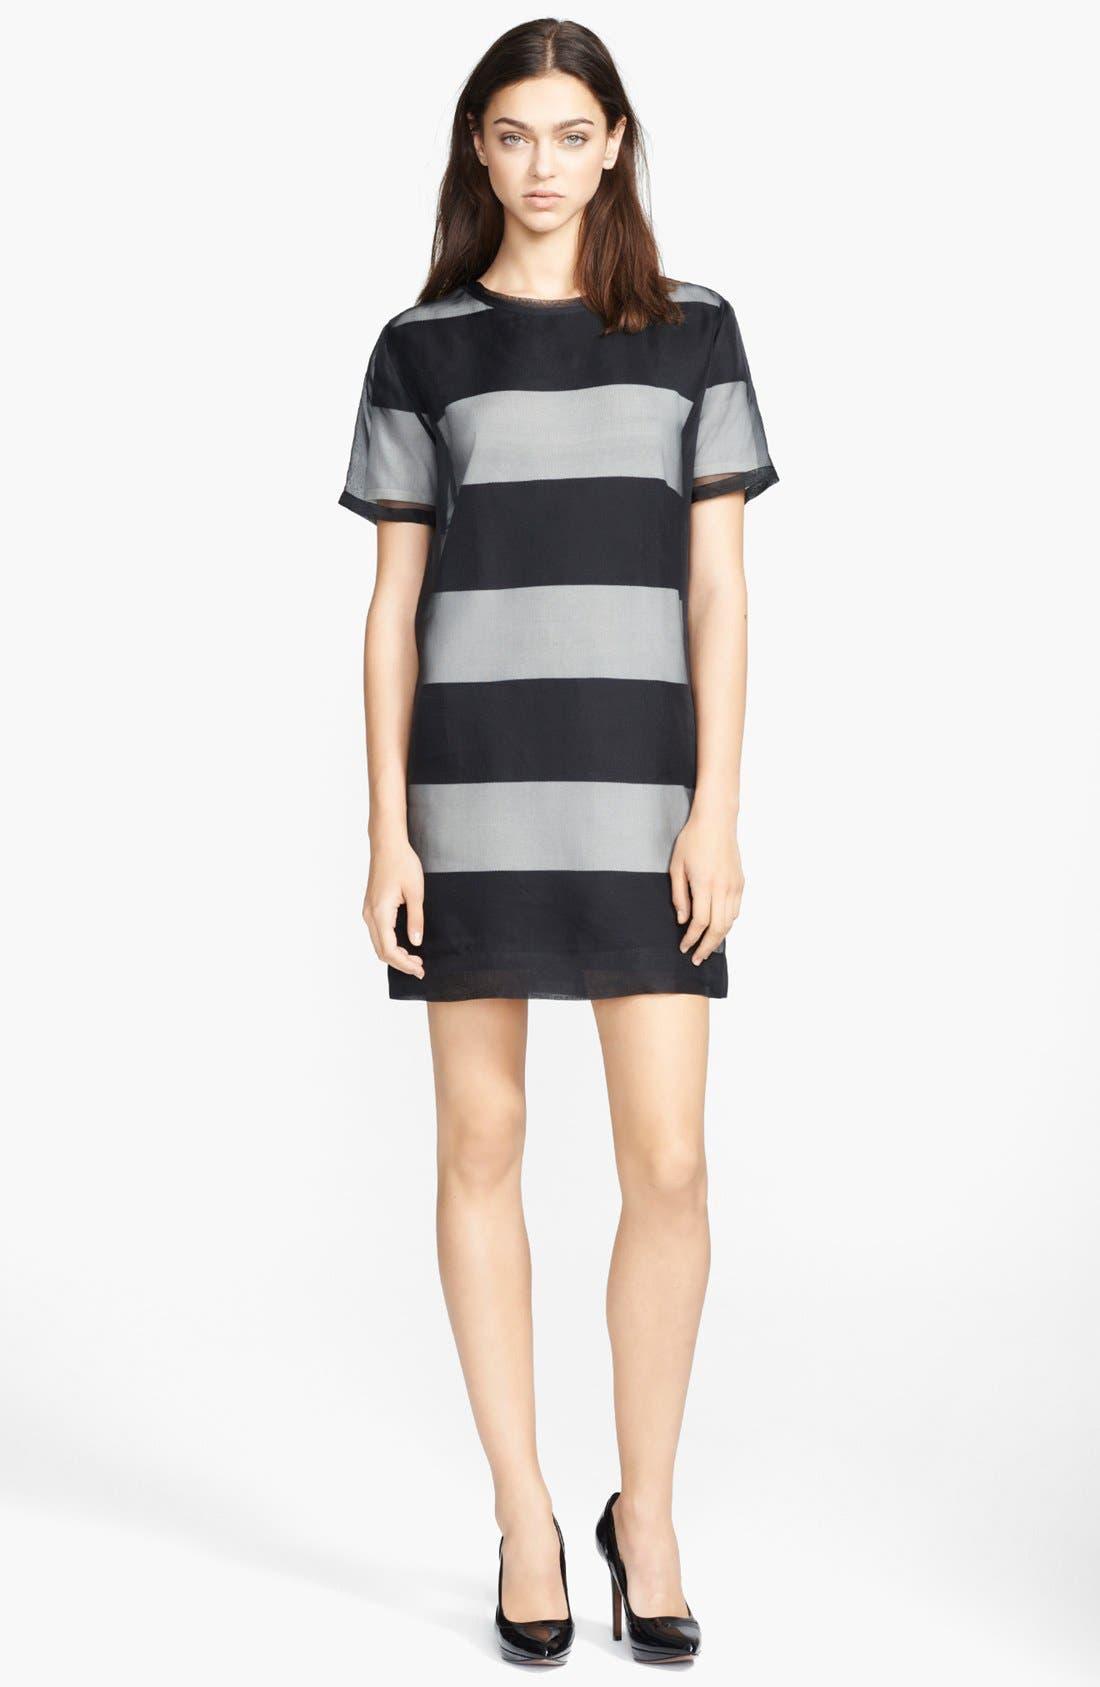 Alternate Image 1 Selected - T by Alexander Wang Organza Overlay Stripe T-Shirt Dress